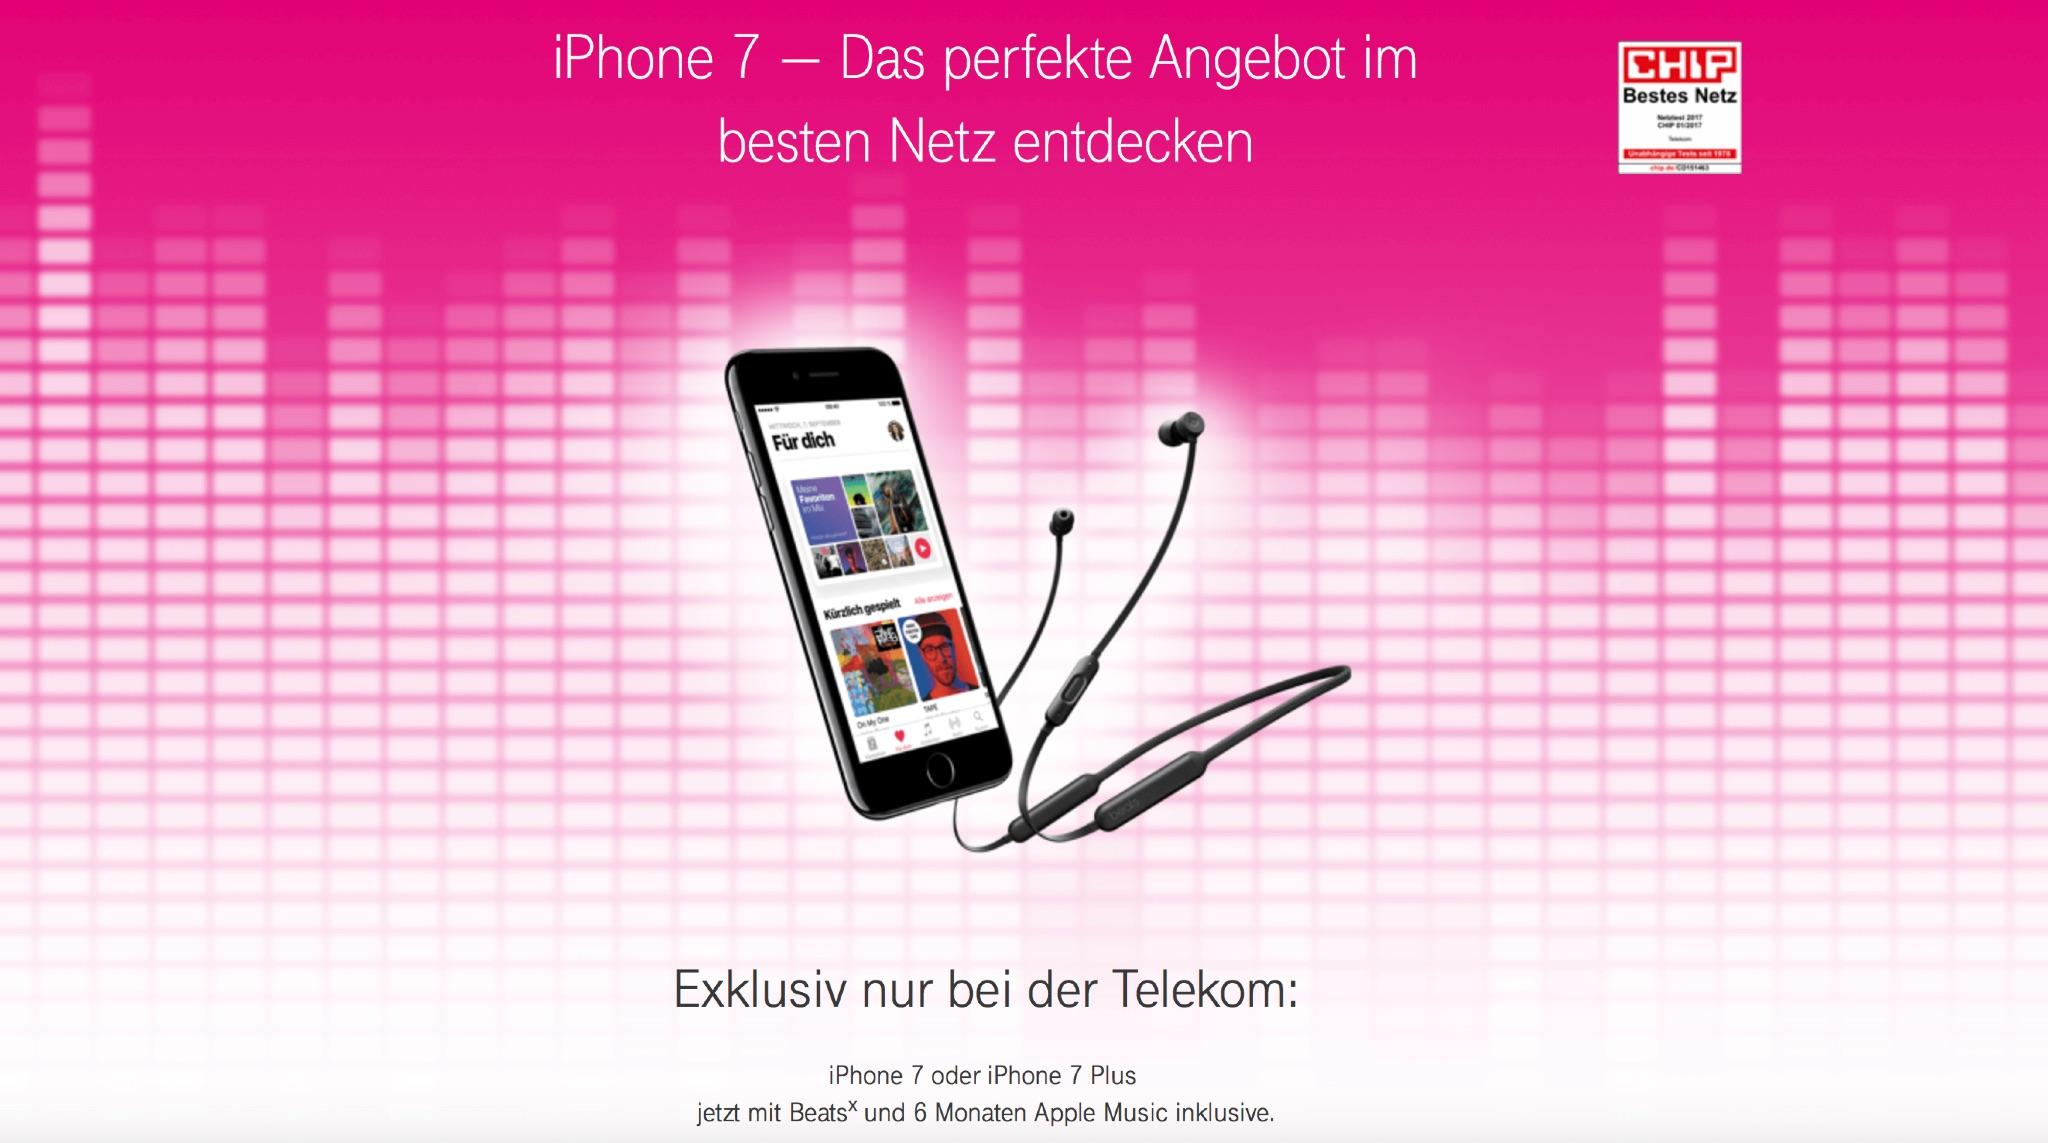 telekom deal iphone 7 plus beatsx 6 monate apple. Black Bedroom Furniture Sets. Home Design Ideas